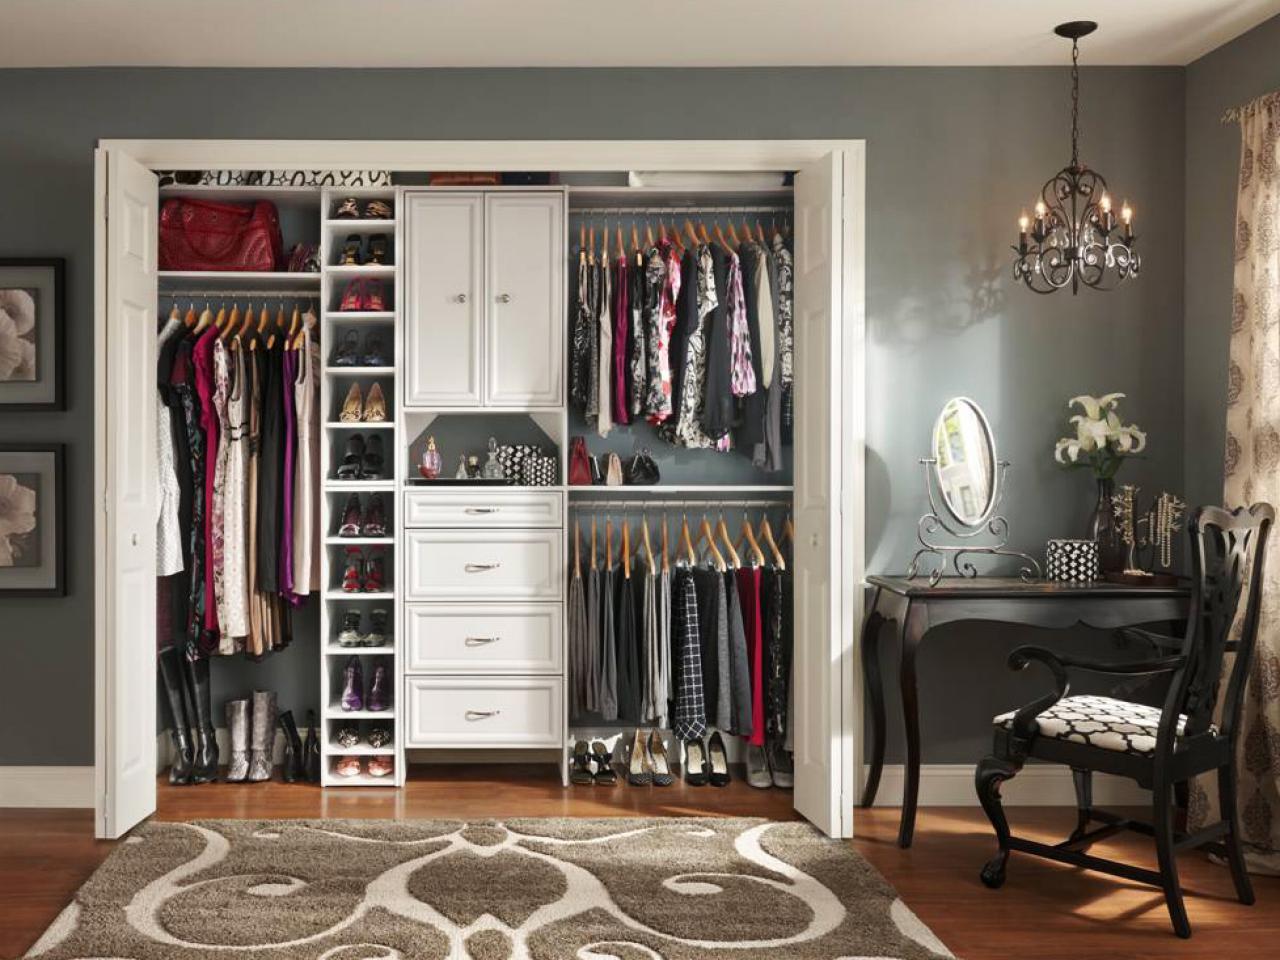 best 25+ small closet organization ideas on pinterest   small closets,  small GVMHPJJ